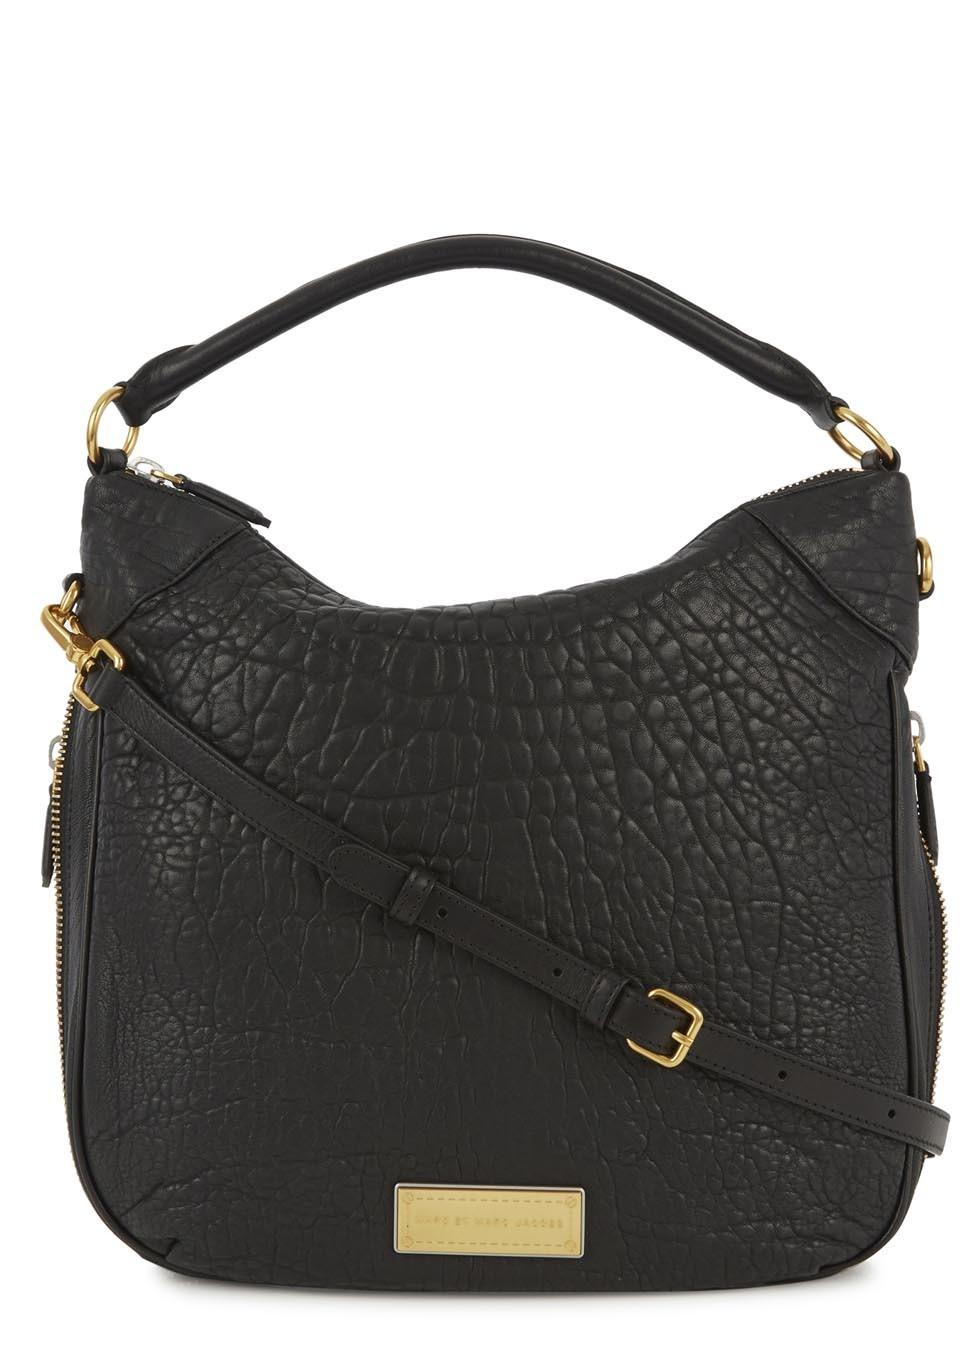 299840120cf Marc Jacobs Hobo Bag Black Leather | Stanford Center for Opportunity ...